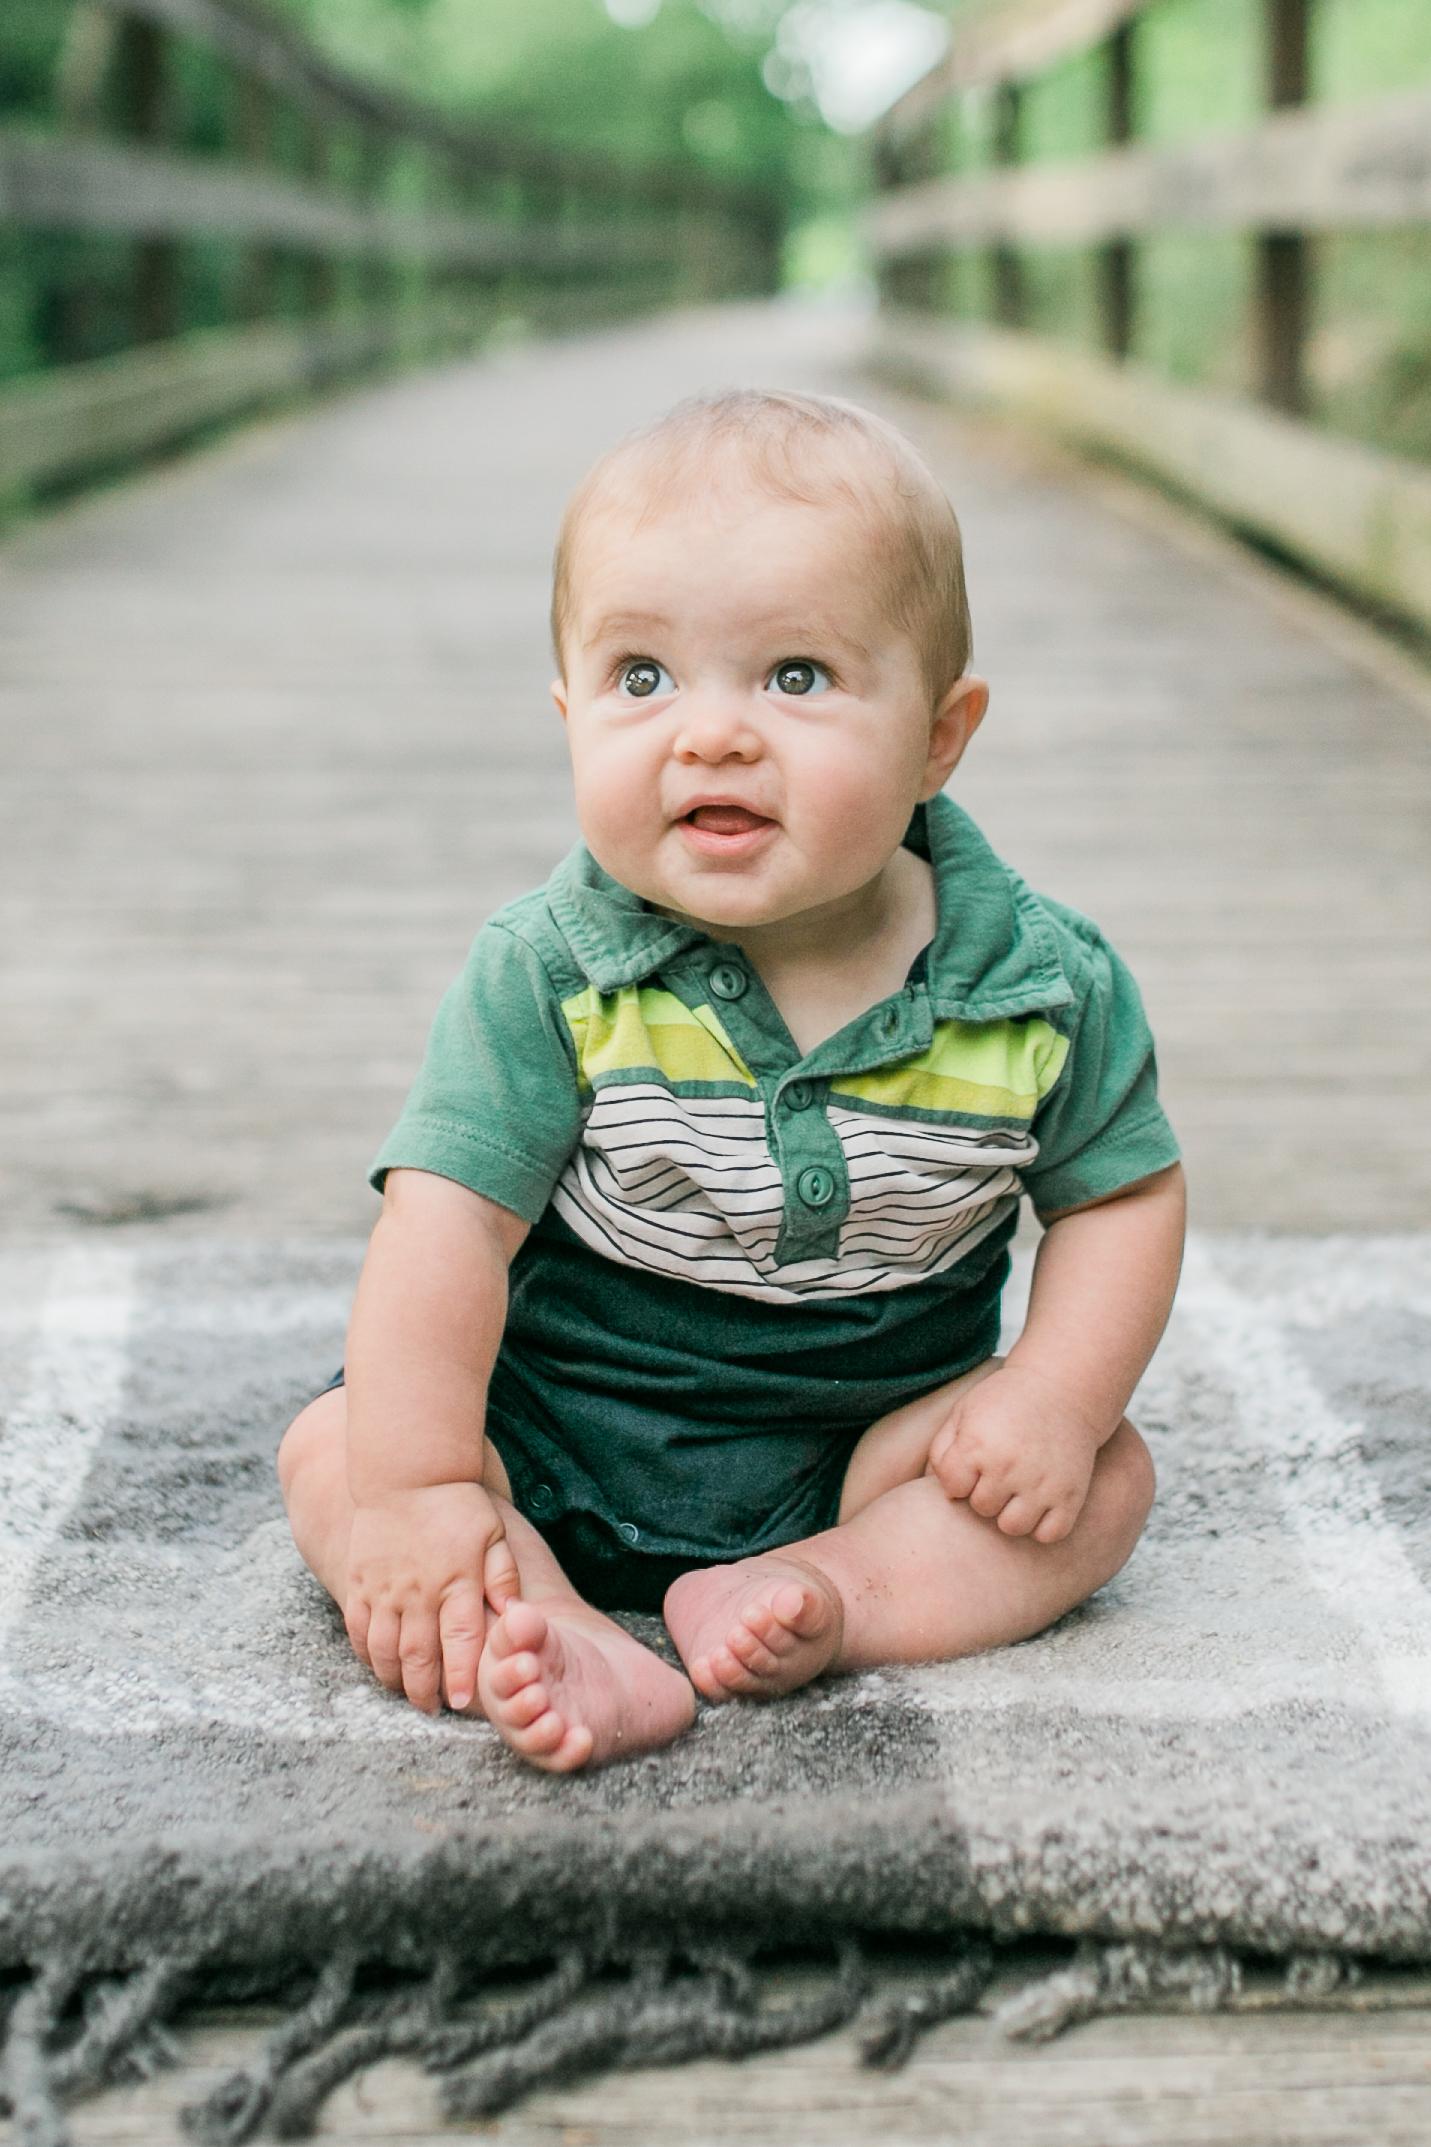 vanessa wyler pewaukee family photography nagawaukee park delafield 6 months old